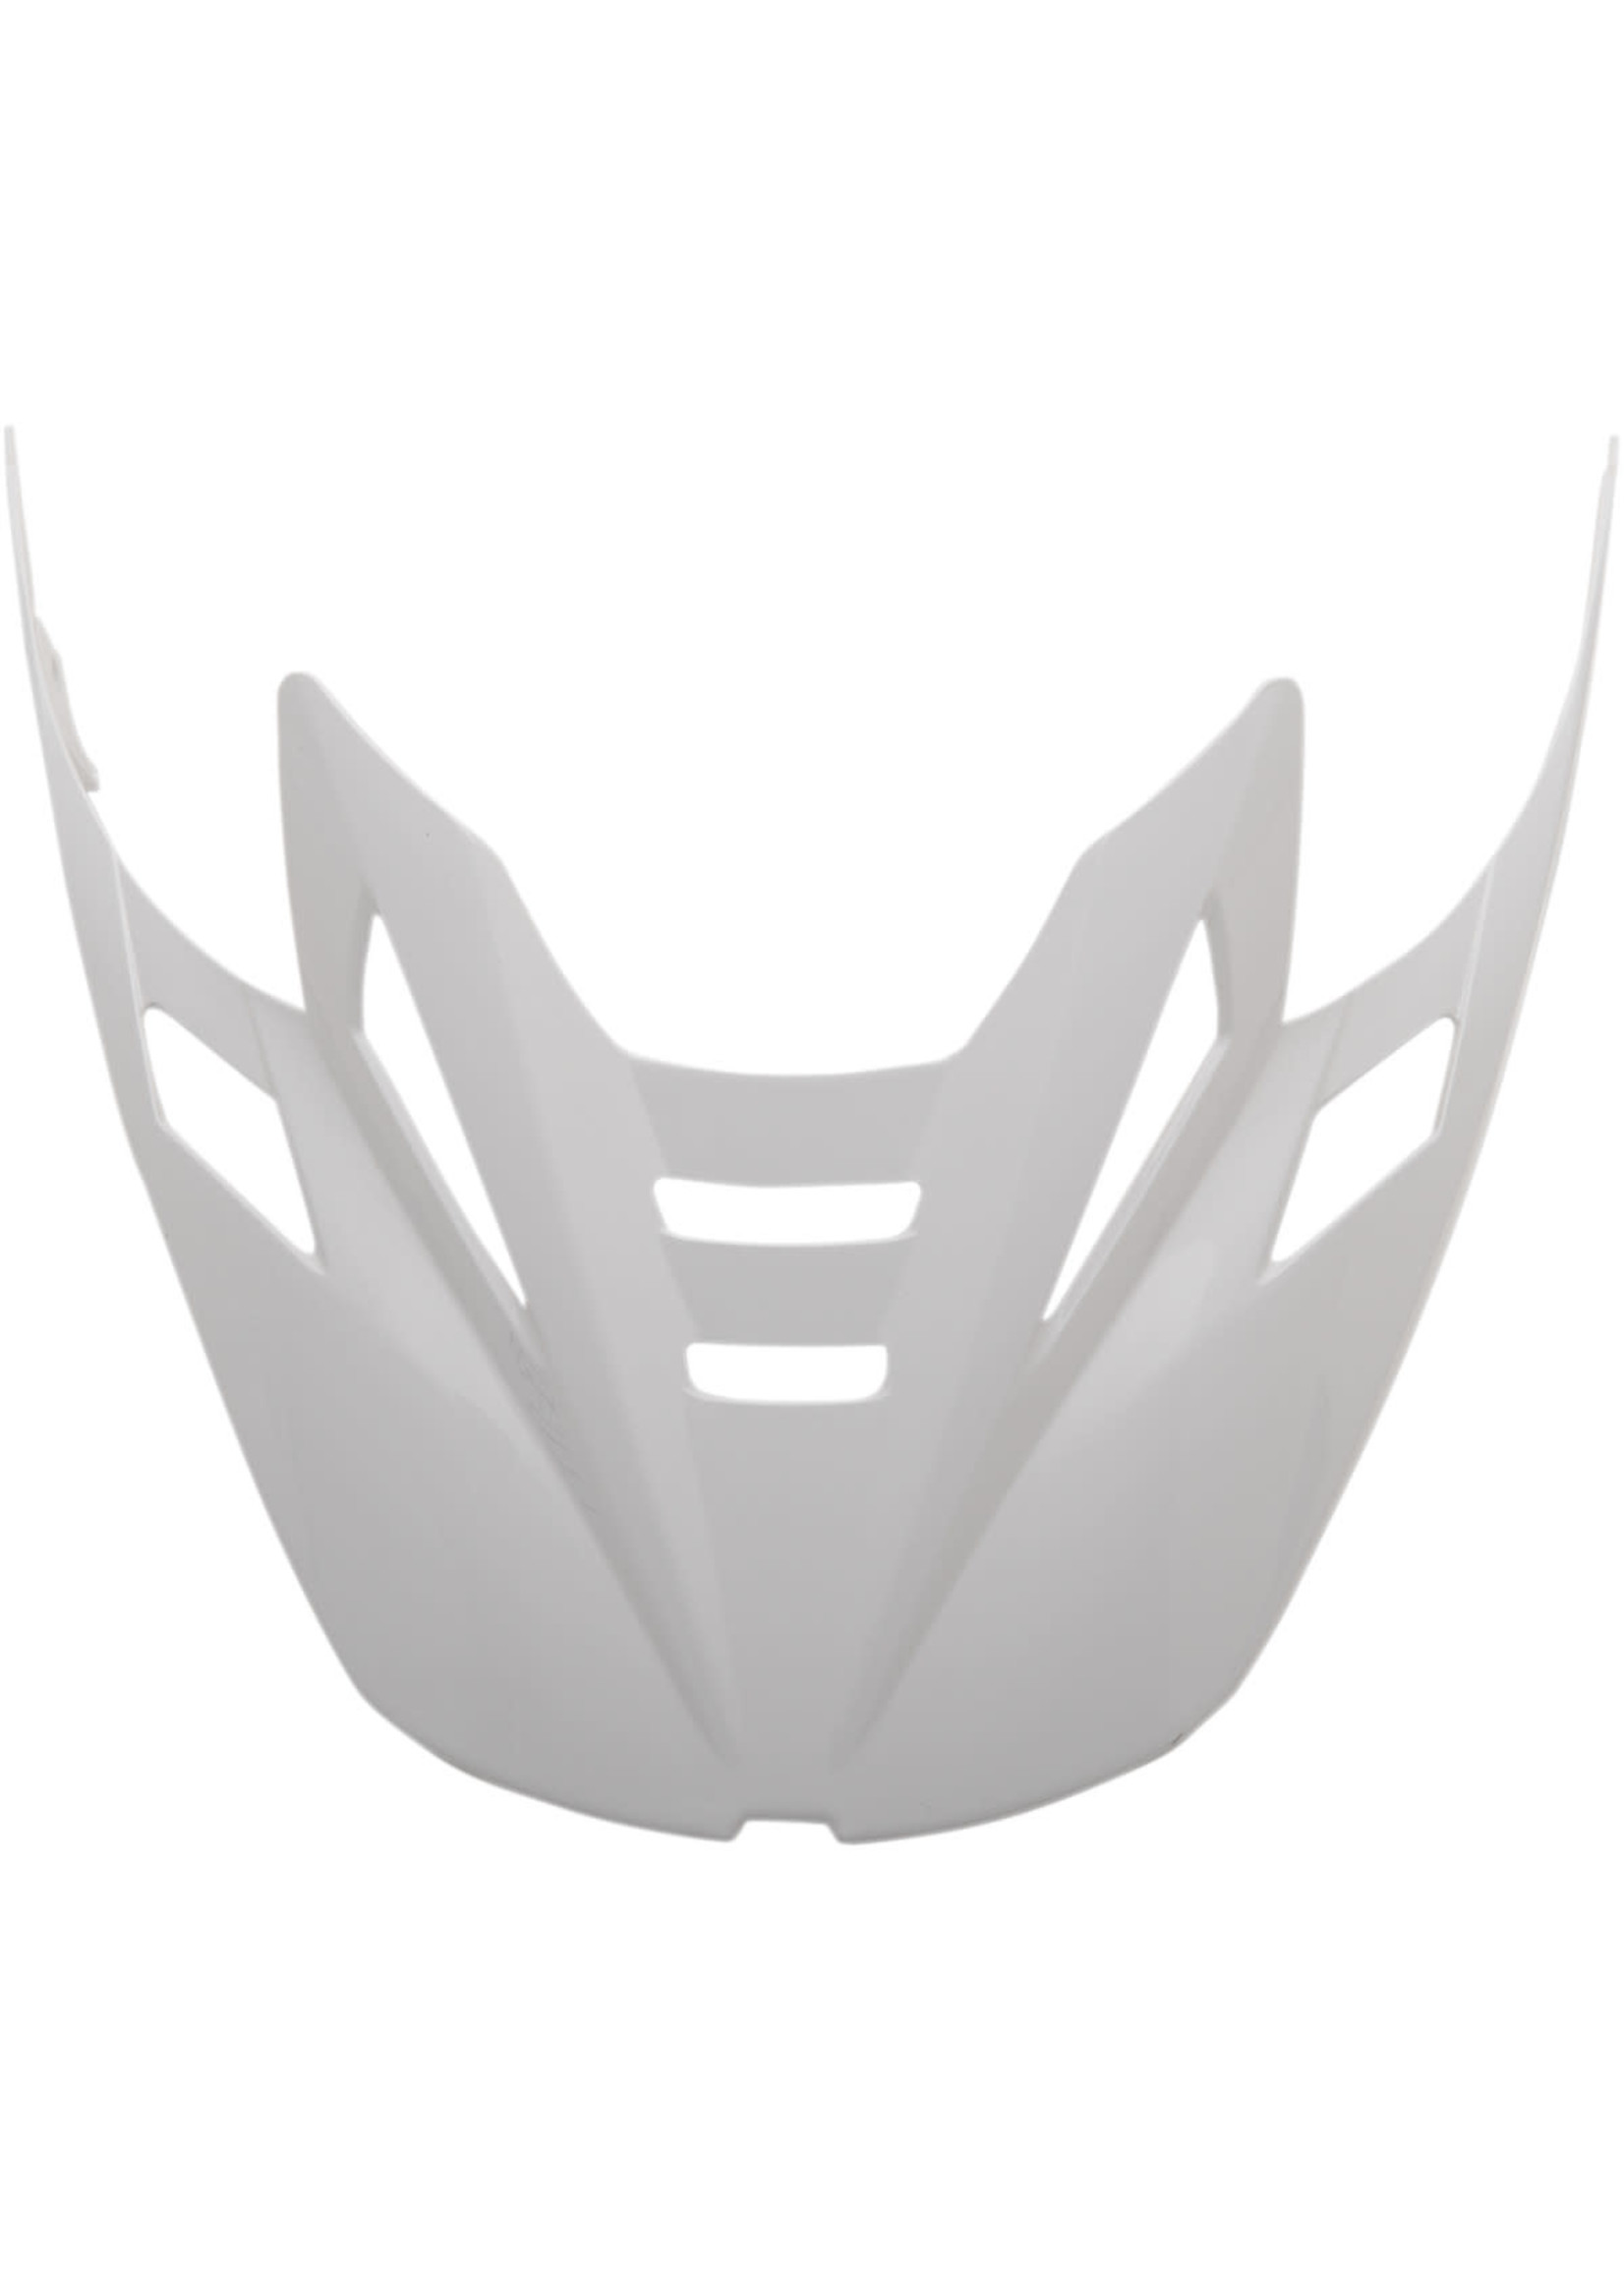 ICON ICON Airflite™ Helmet Peak